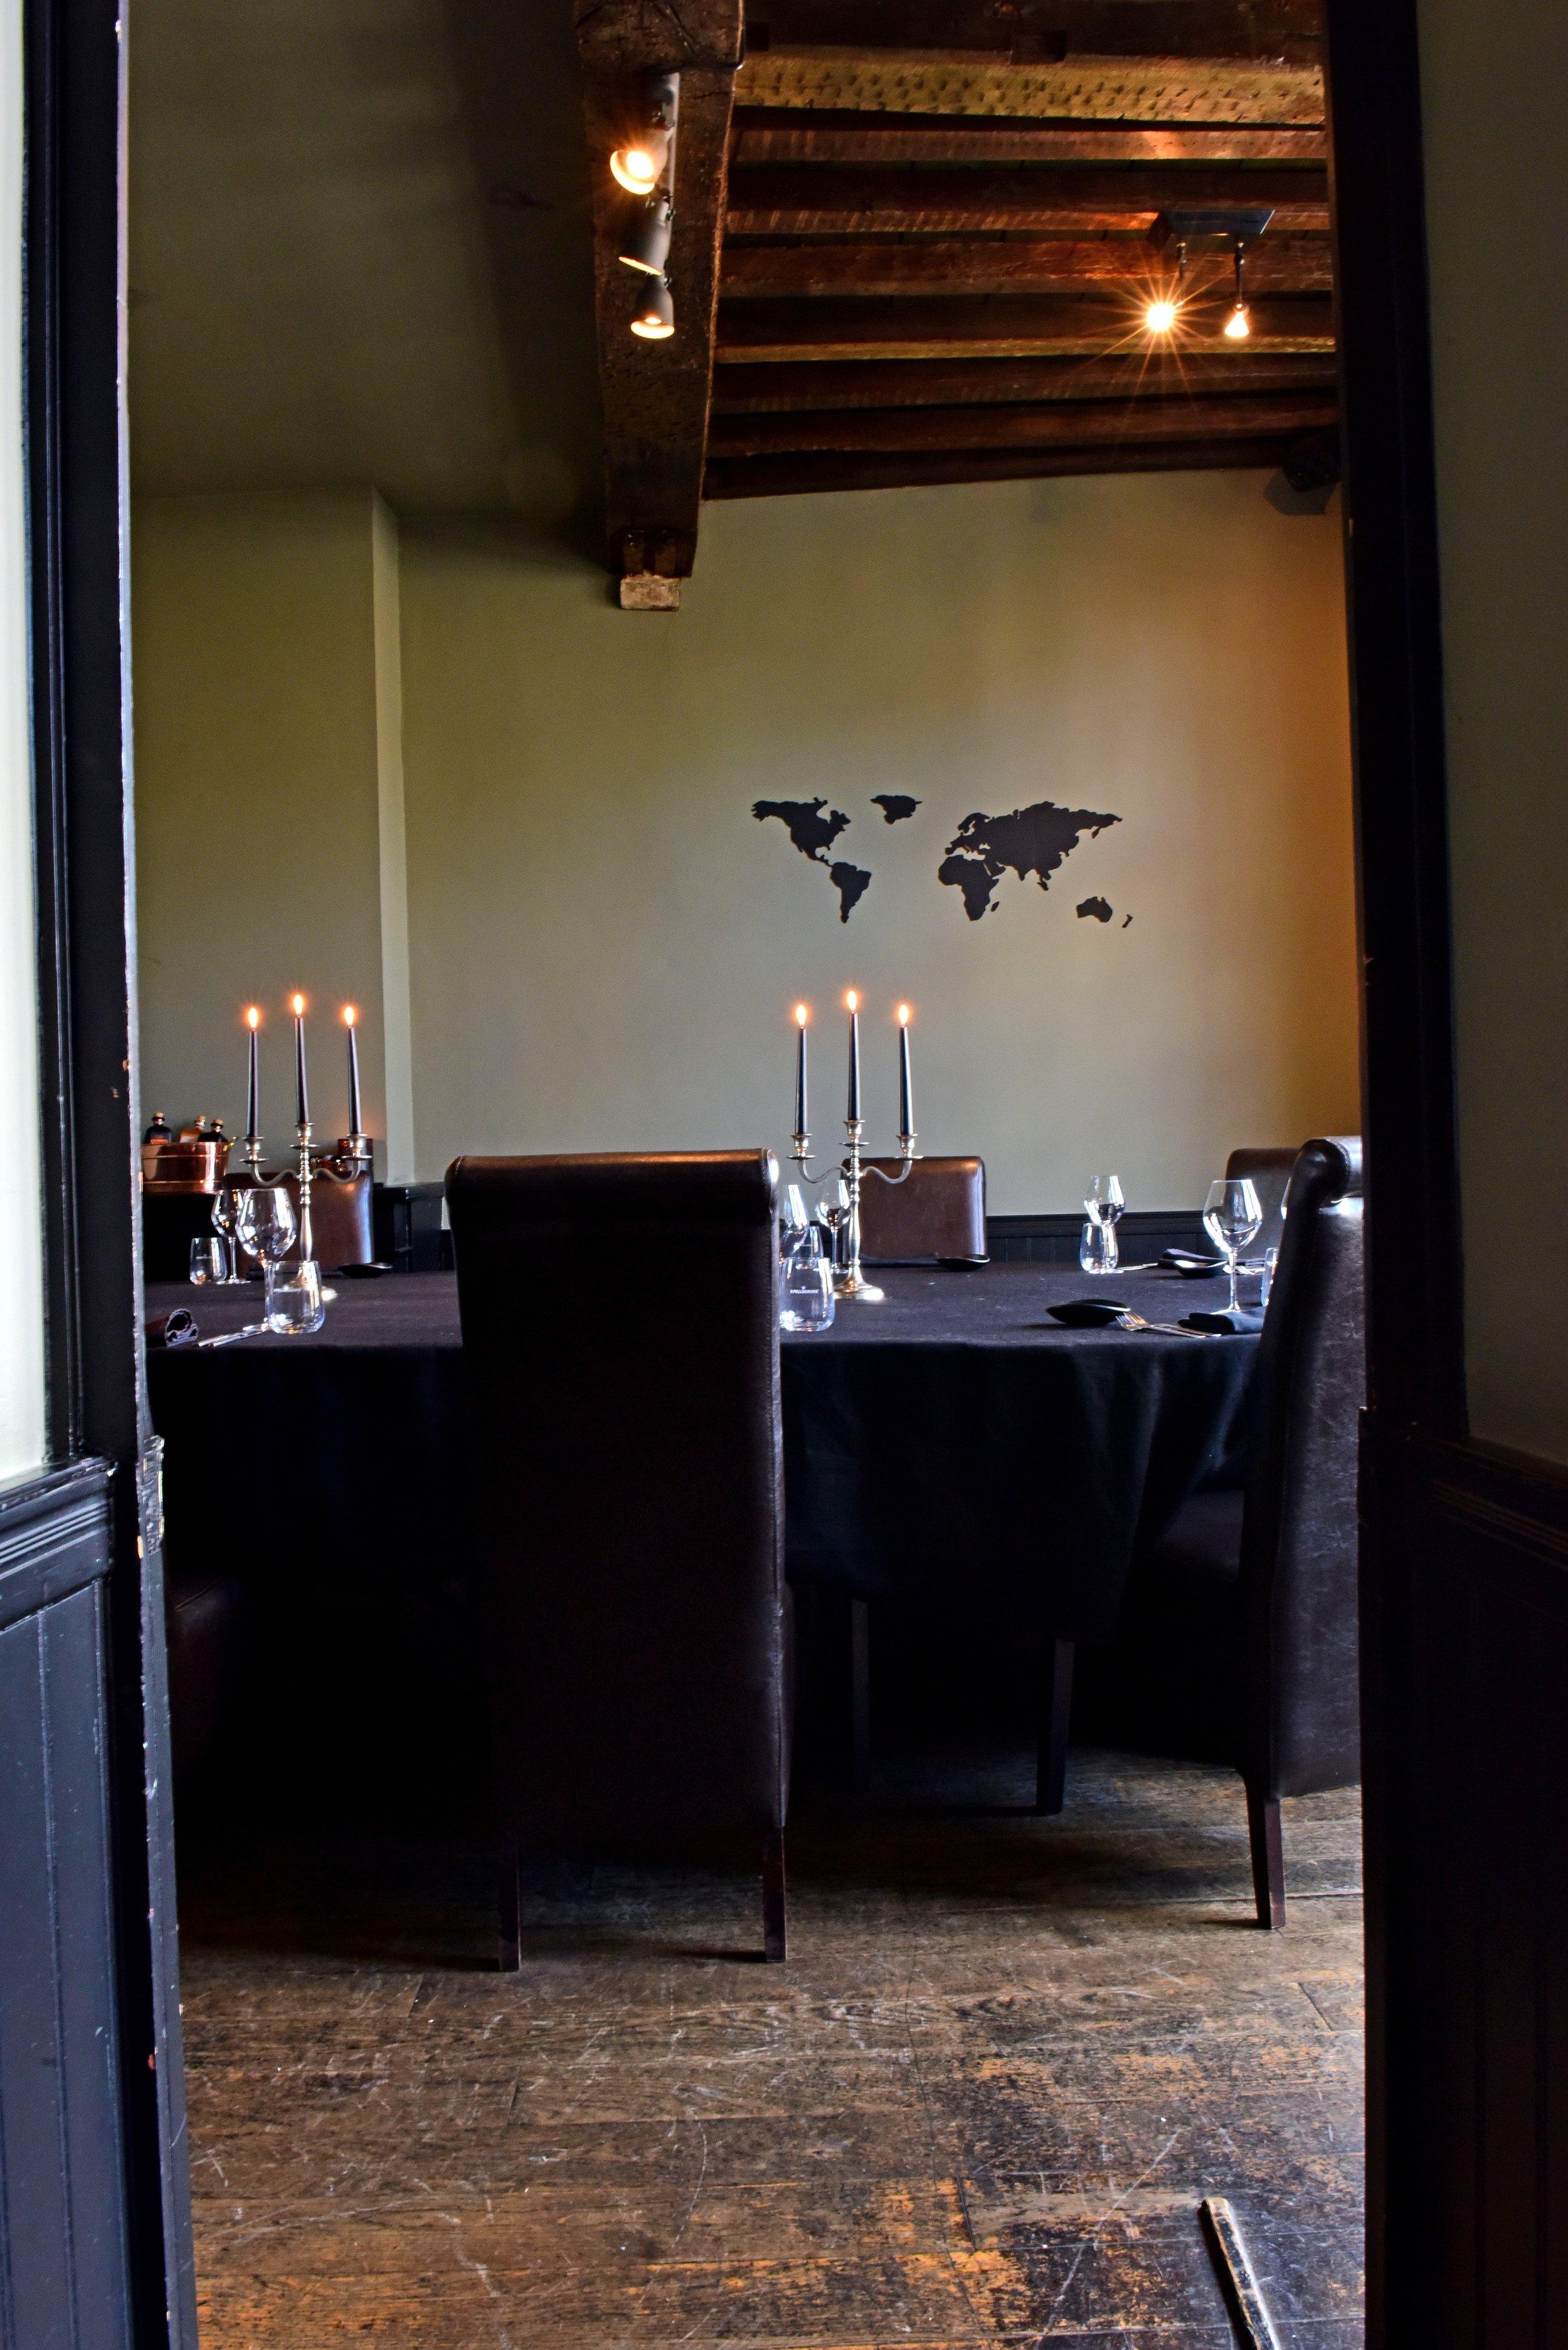 12 brasserie restaurant barleys barley's dendermonde grote markt bart albrecht tablefever.jpg